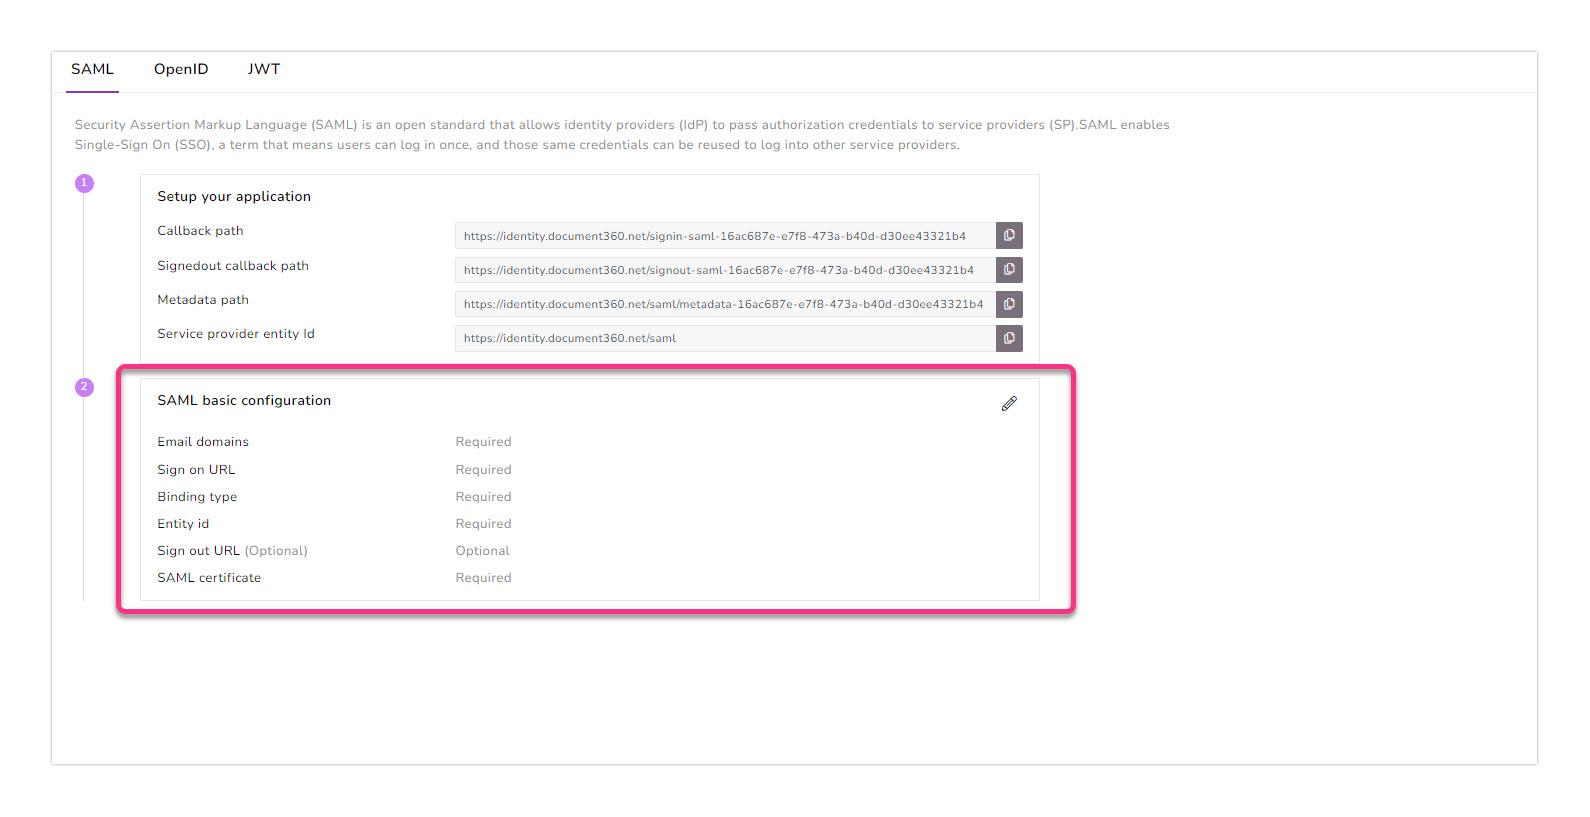 11_Screenshot-SAML-basic-configuration-parameters-in-Document360